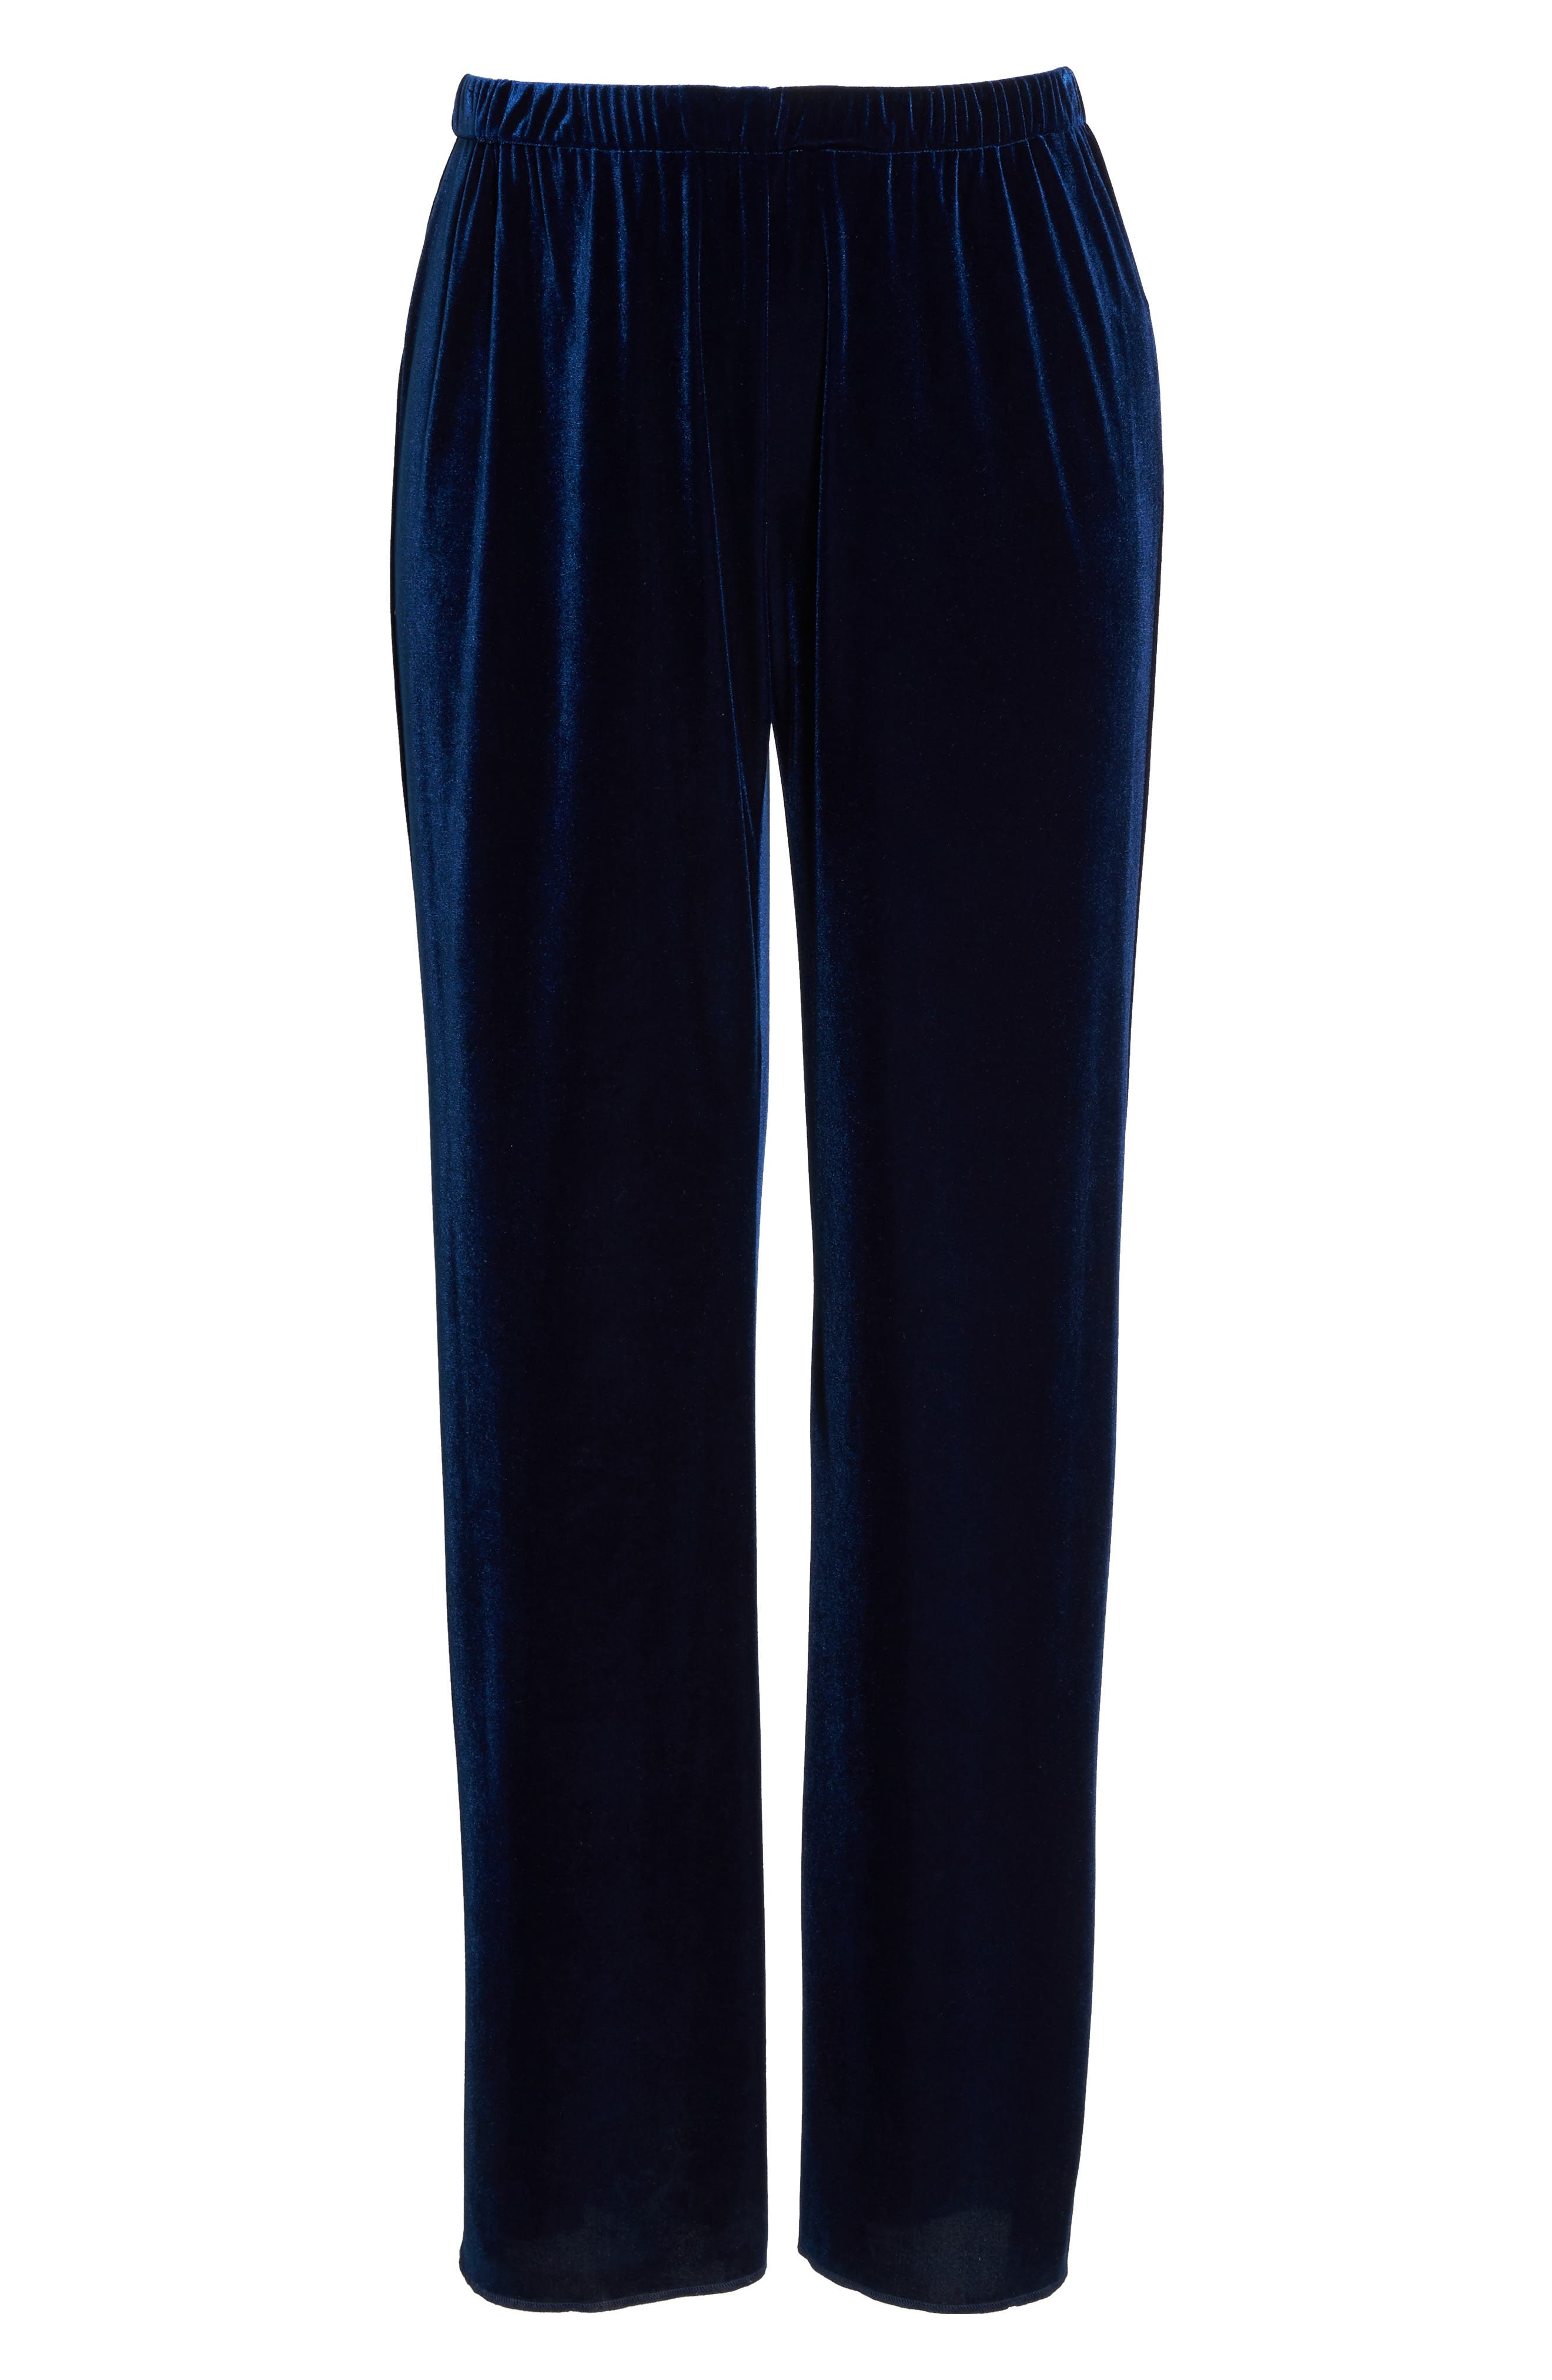 Rosita Velour Pants,                             Alternate thumbnail 6, color,                             Dark Navy